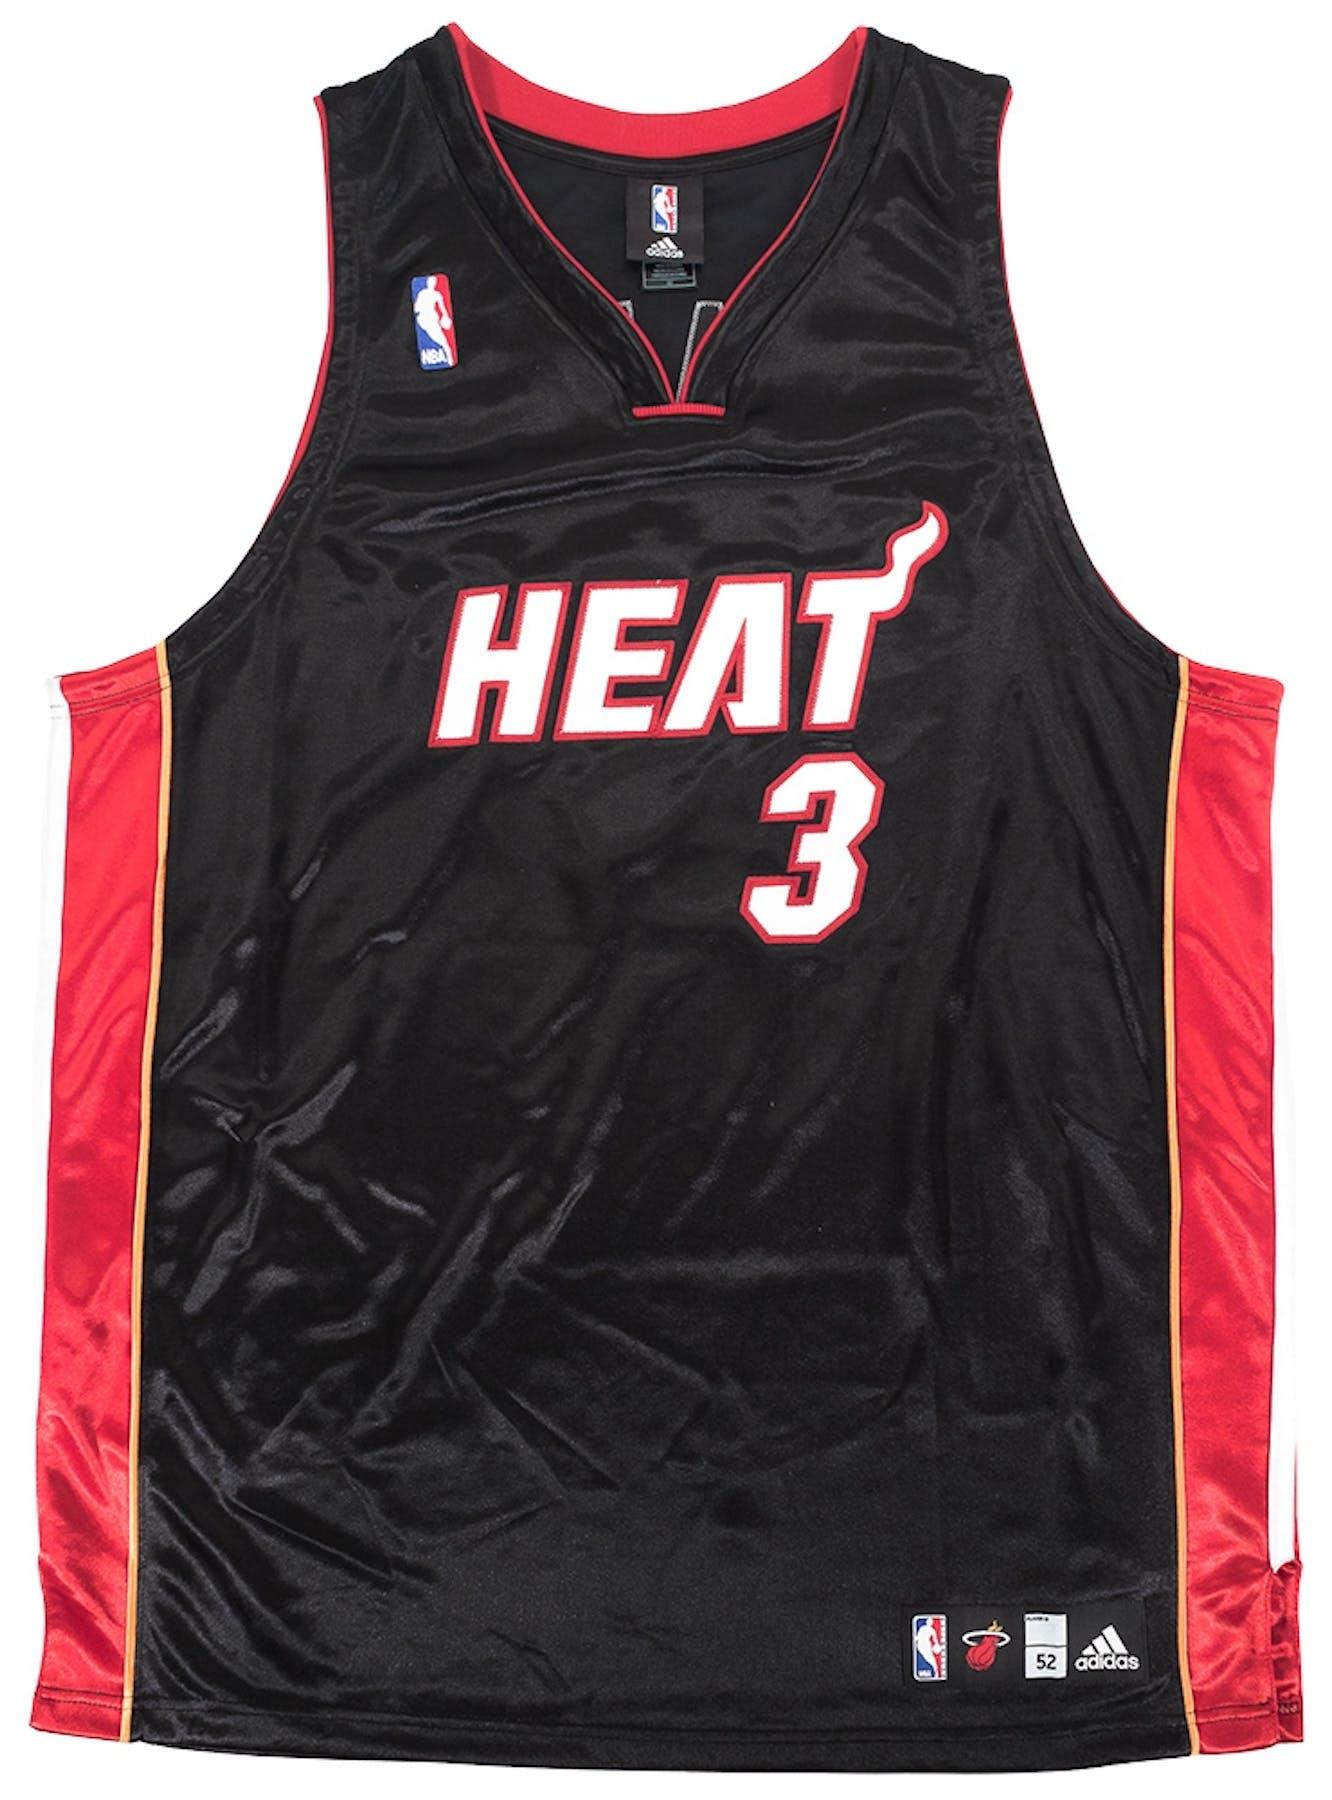 279537f77 Dwyane Wade Autographed Miami Heat Adidas Authentic Basketball ...